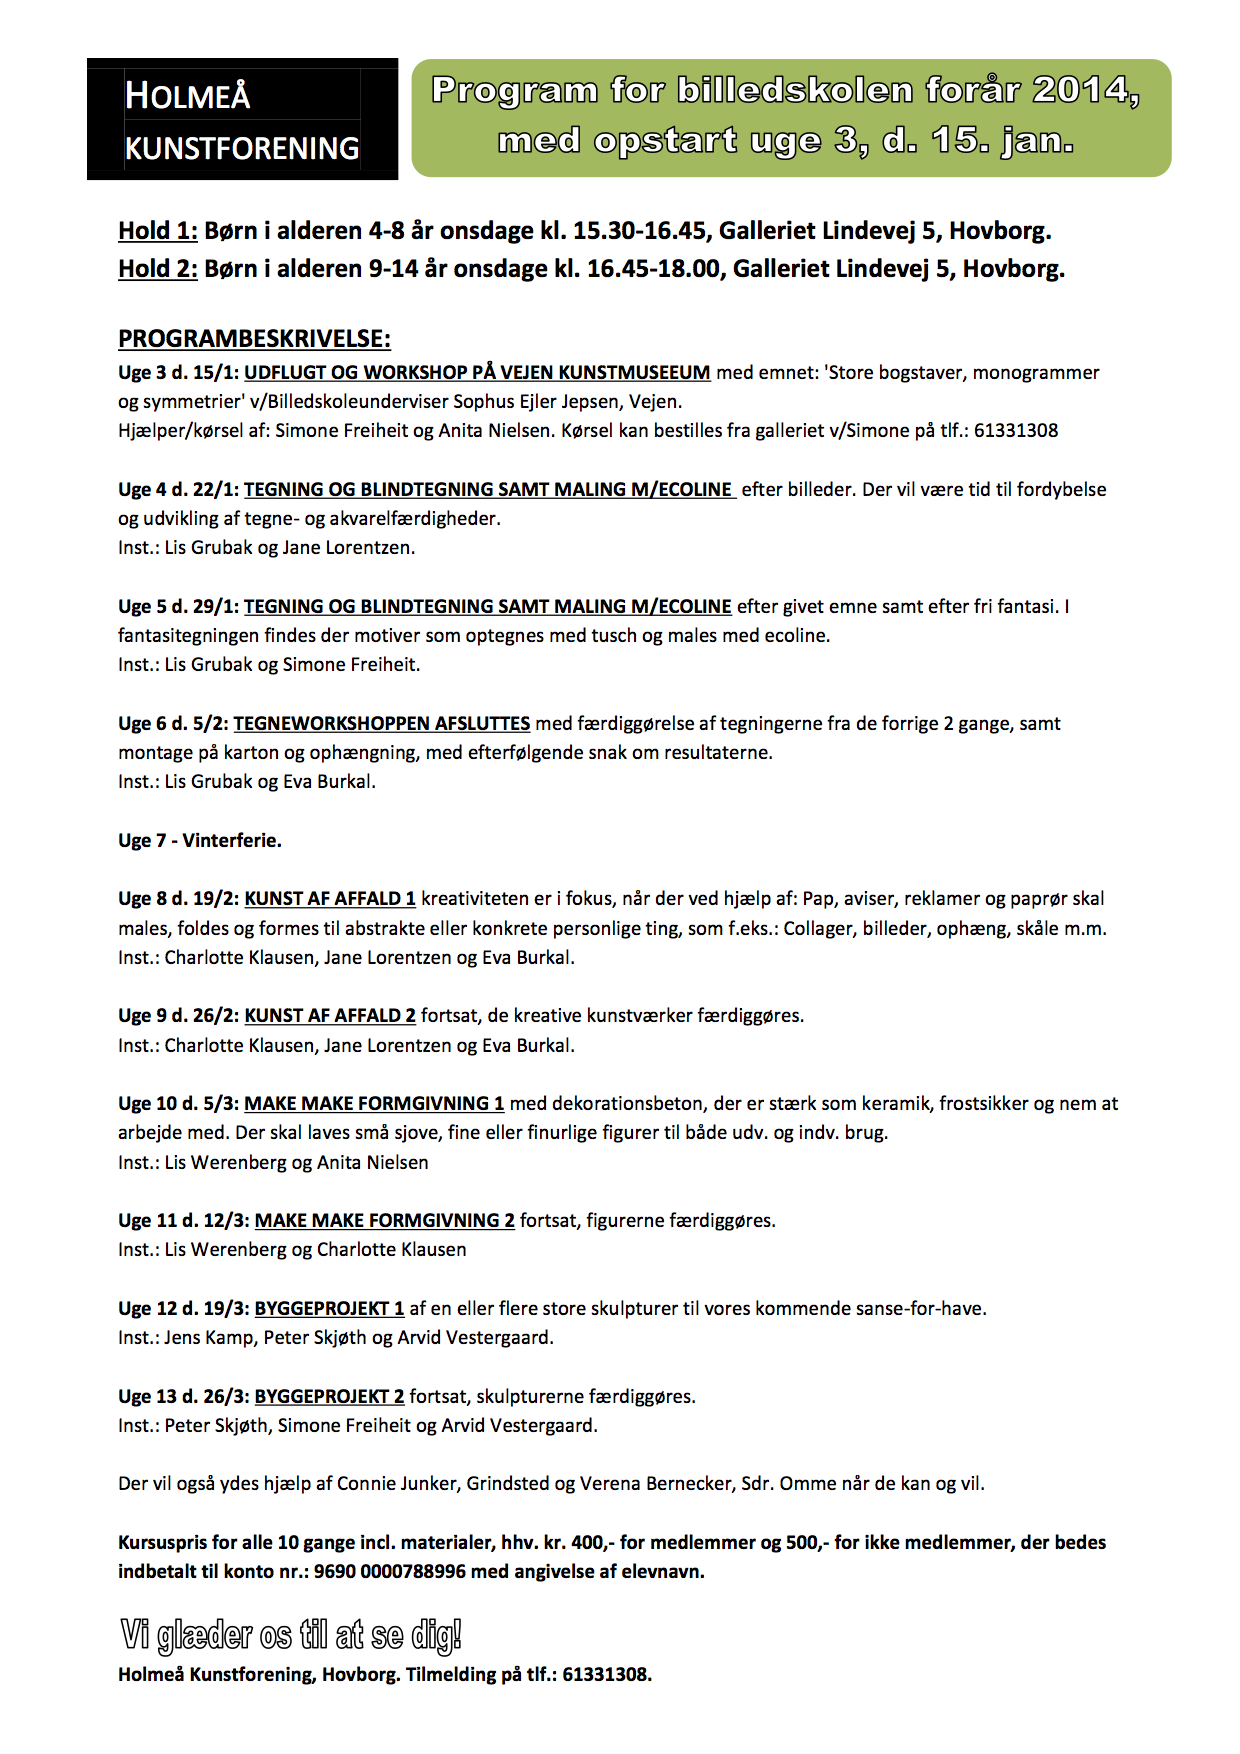 Program billedskolen forår 2014